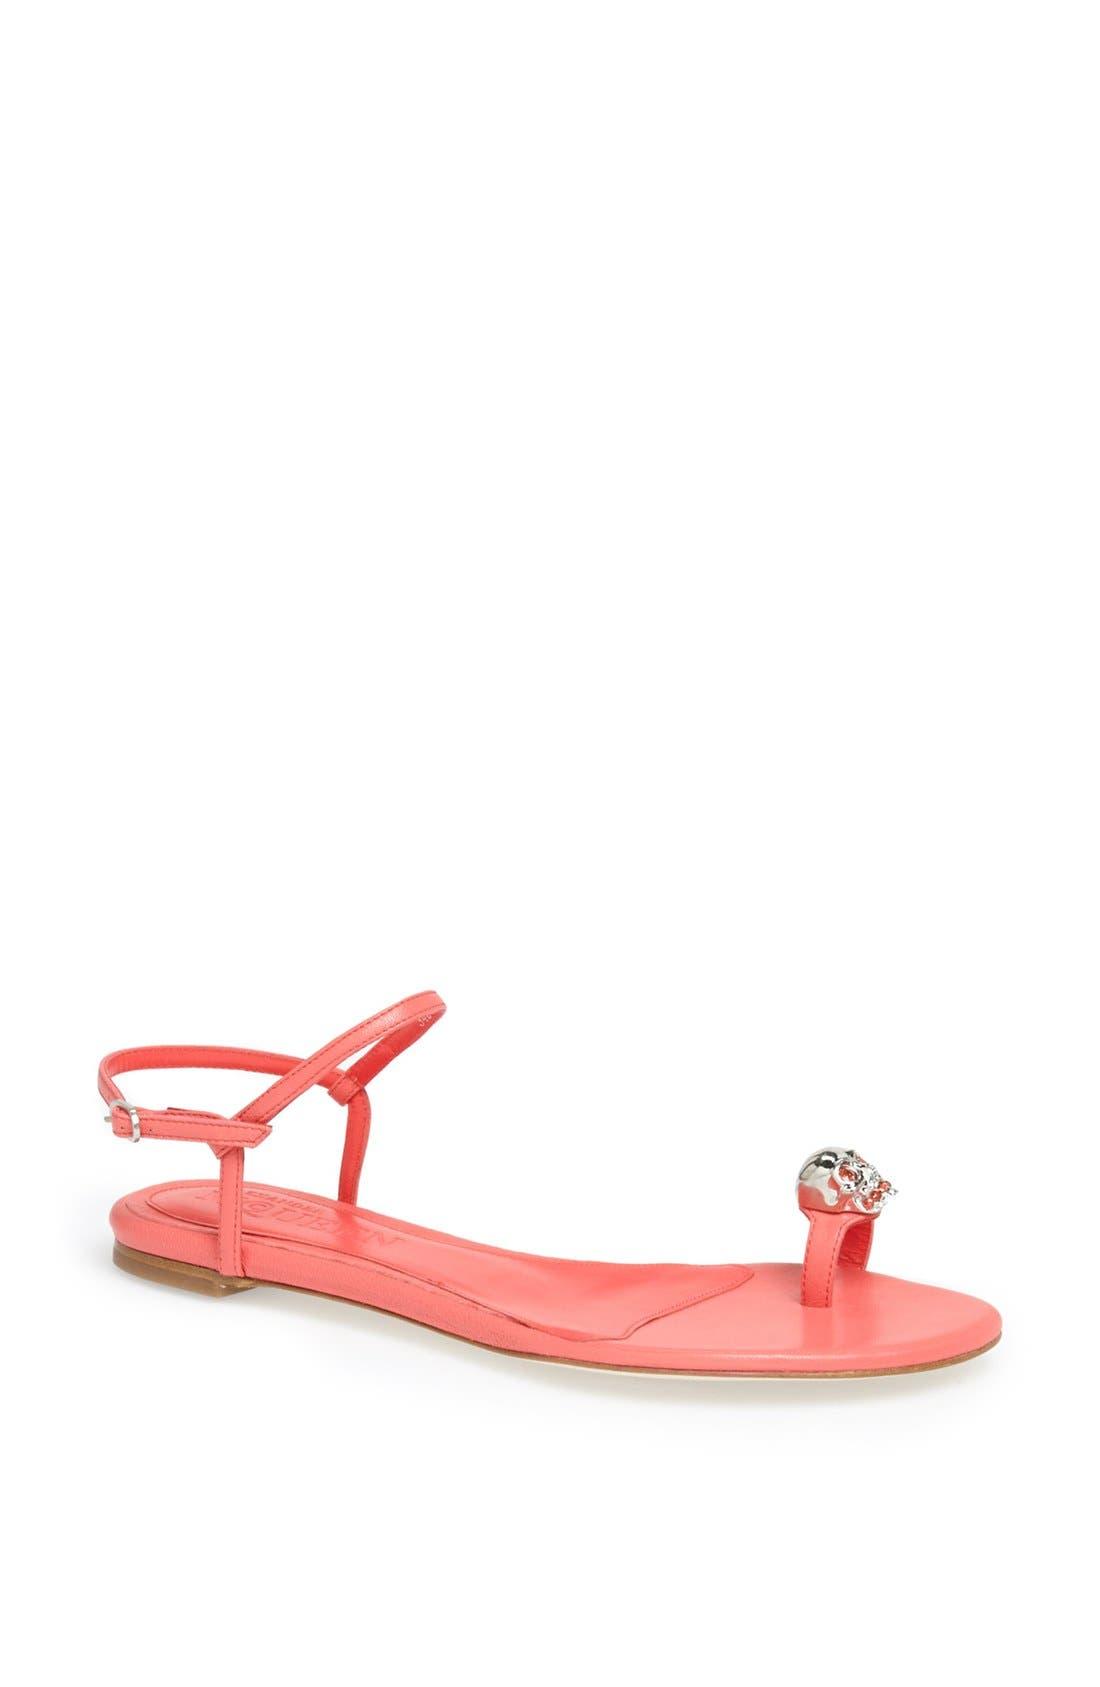 Main Image - Alexander McQueen 'Skull' Sandal